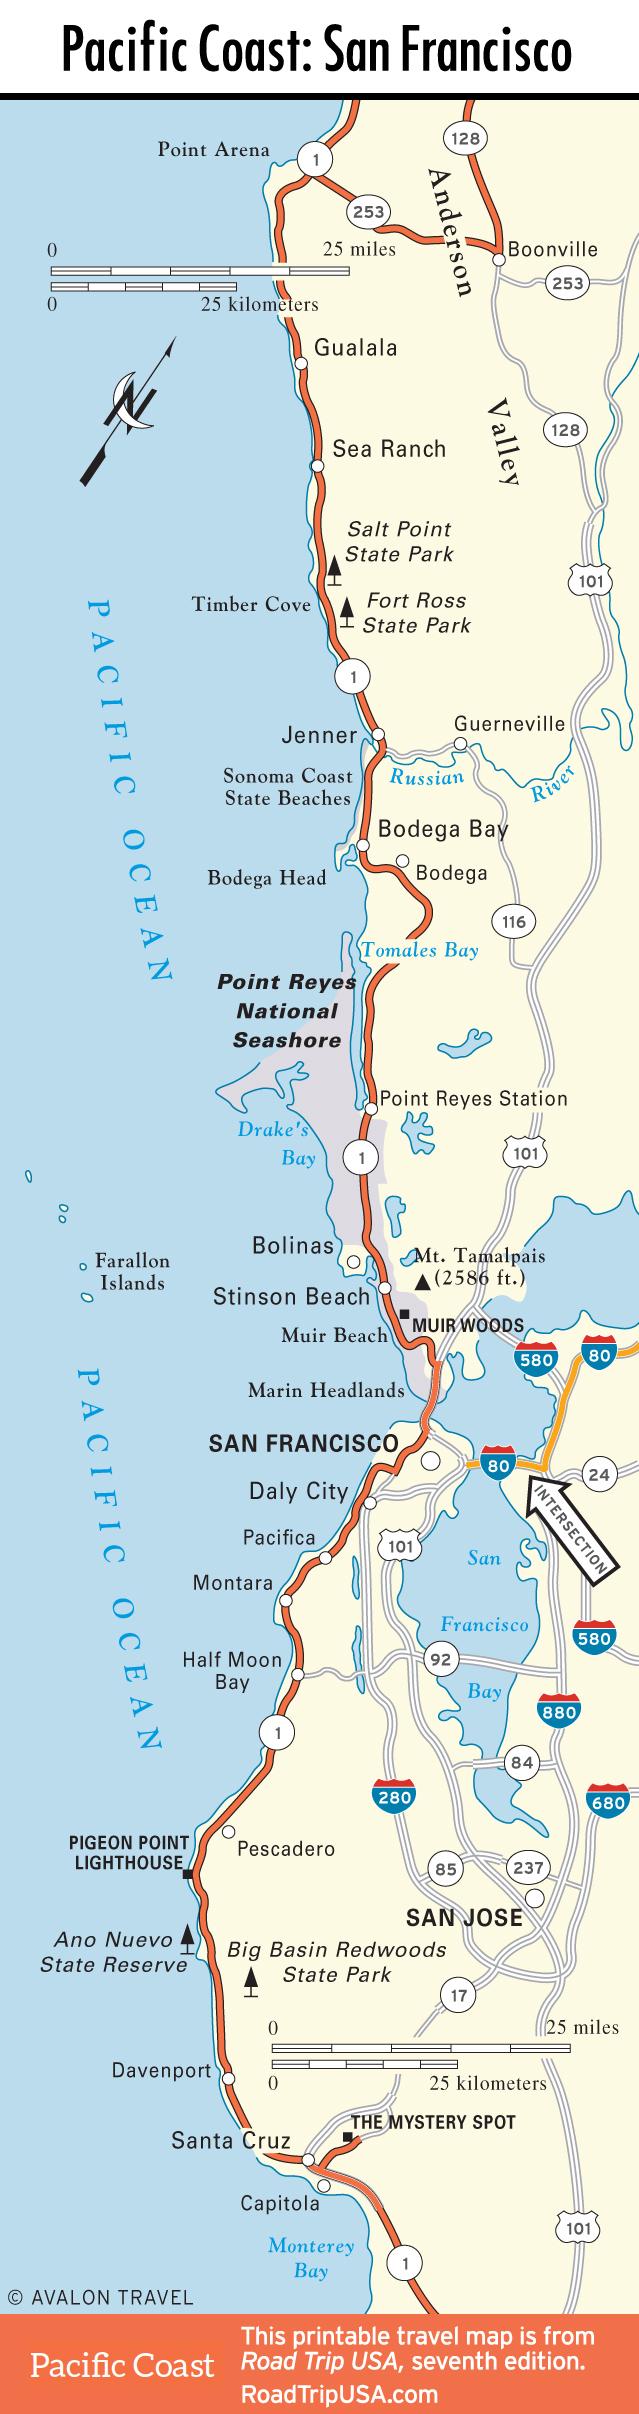 California Coastal Towns Map - Klipy - California Coastal Towns Map